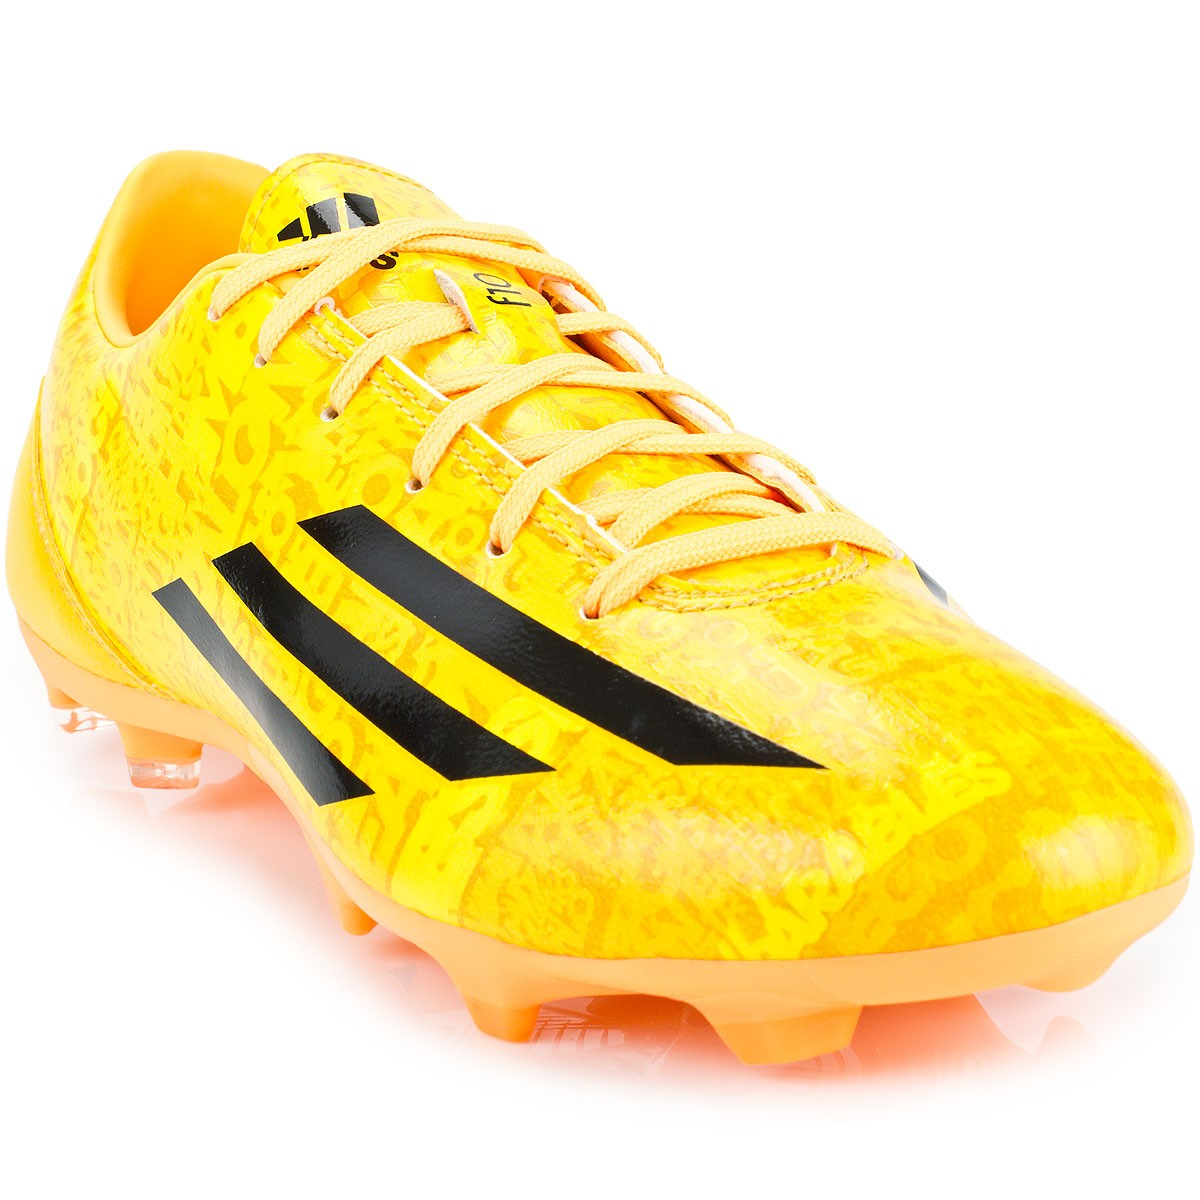 9e01d0bd0b Chuteira Adidas Campo F10 FG Messi